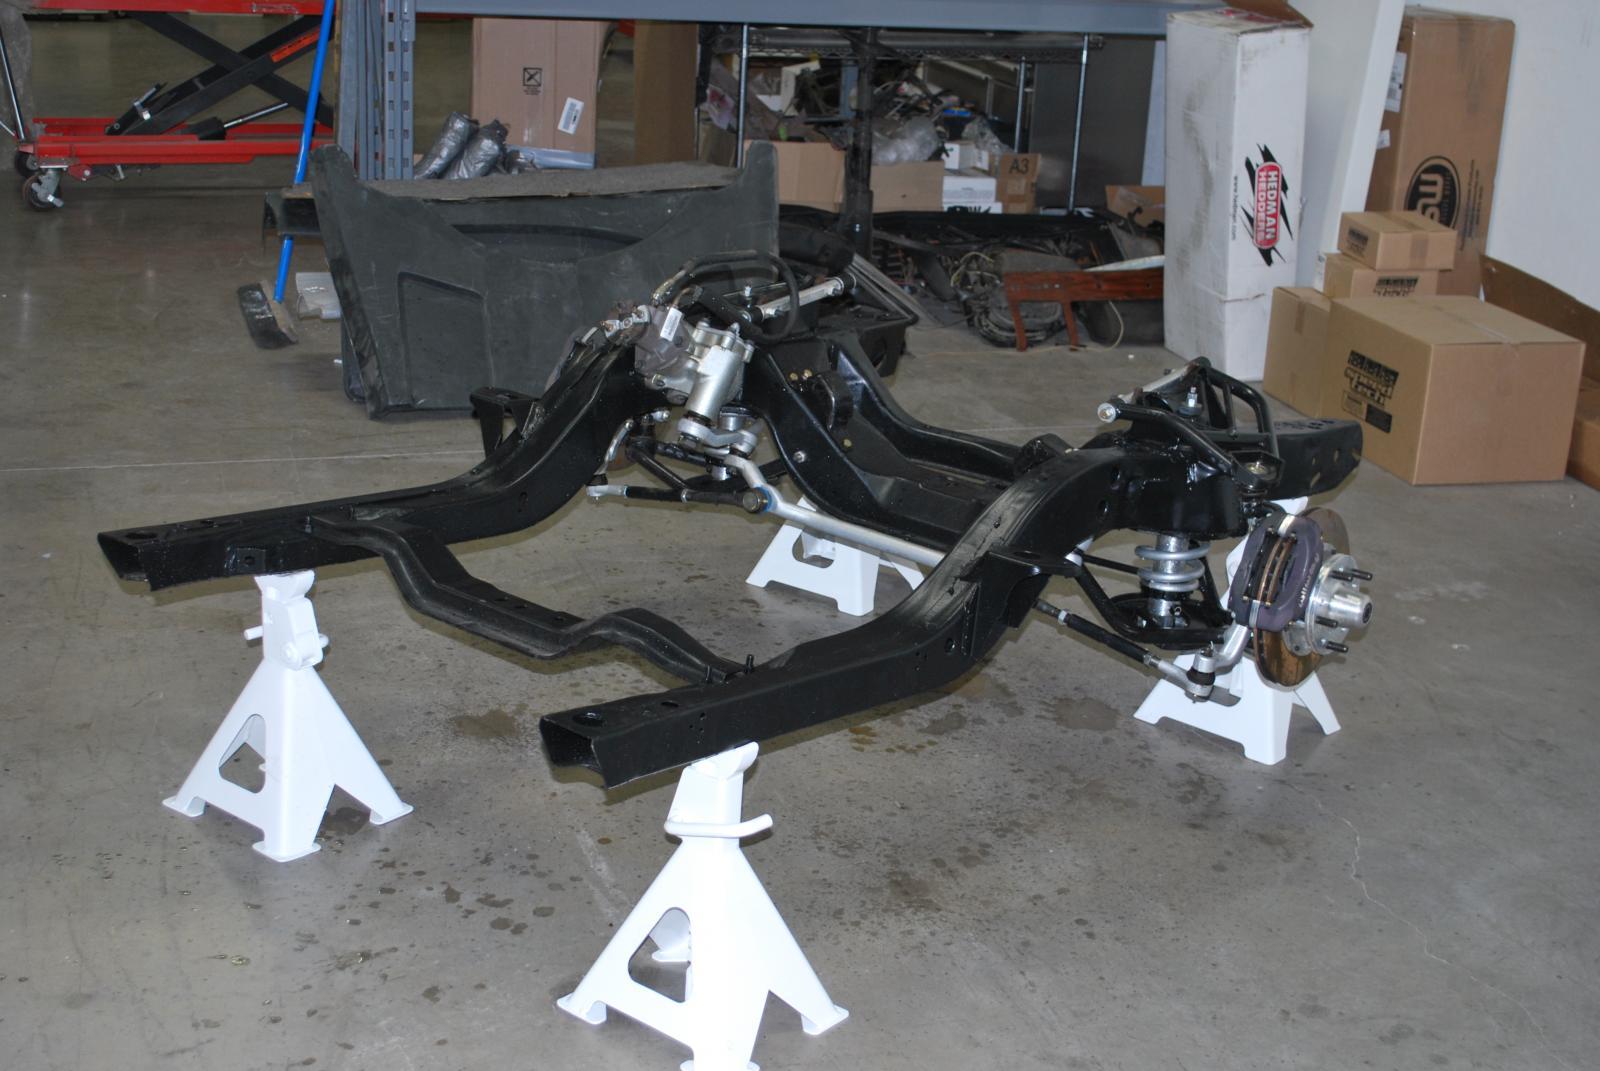 67-69 Camaro Stock Sub Frame Complete